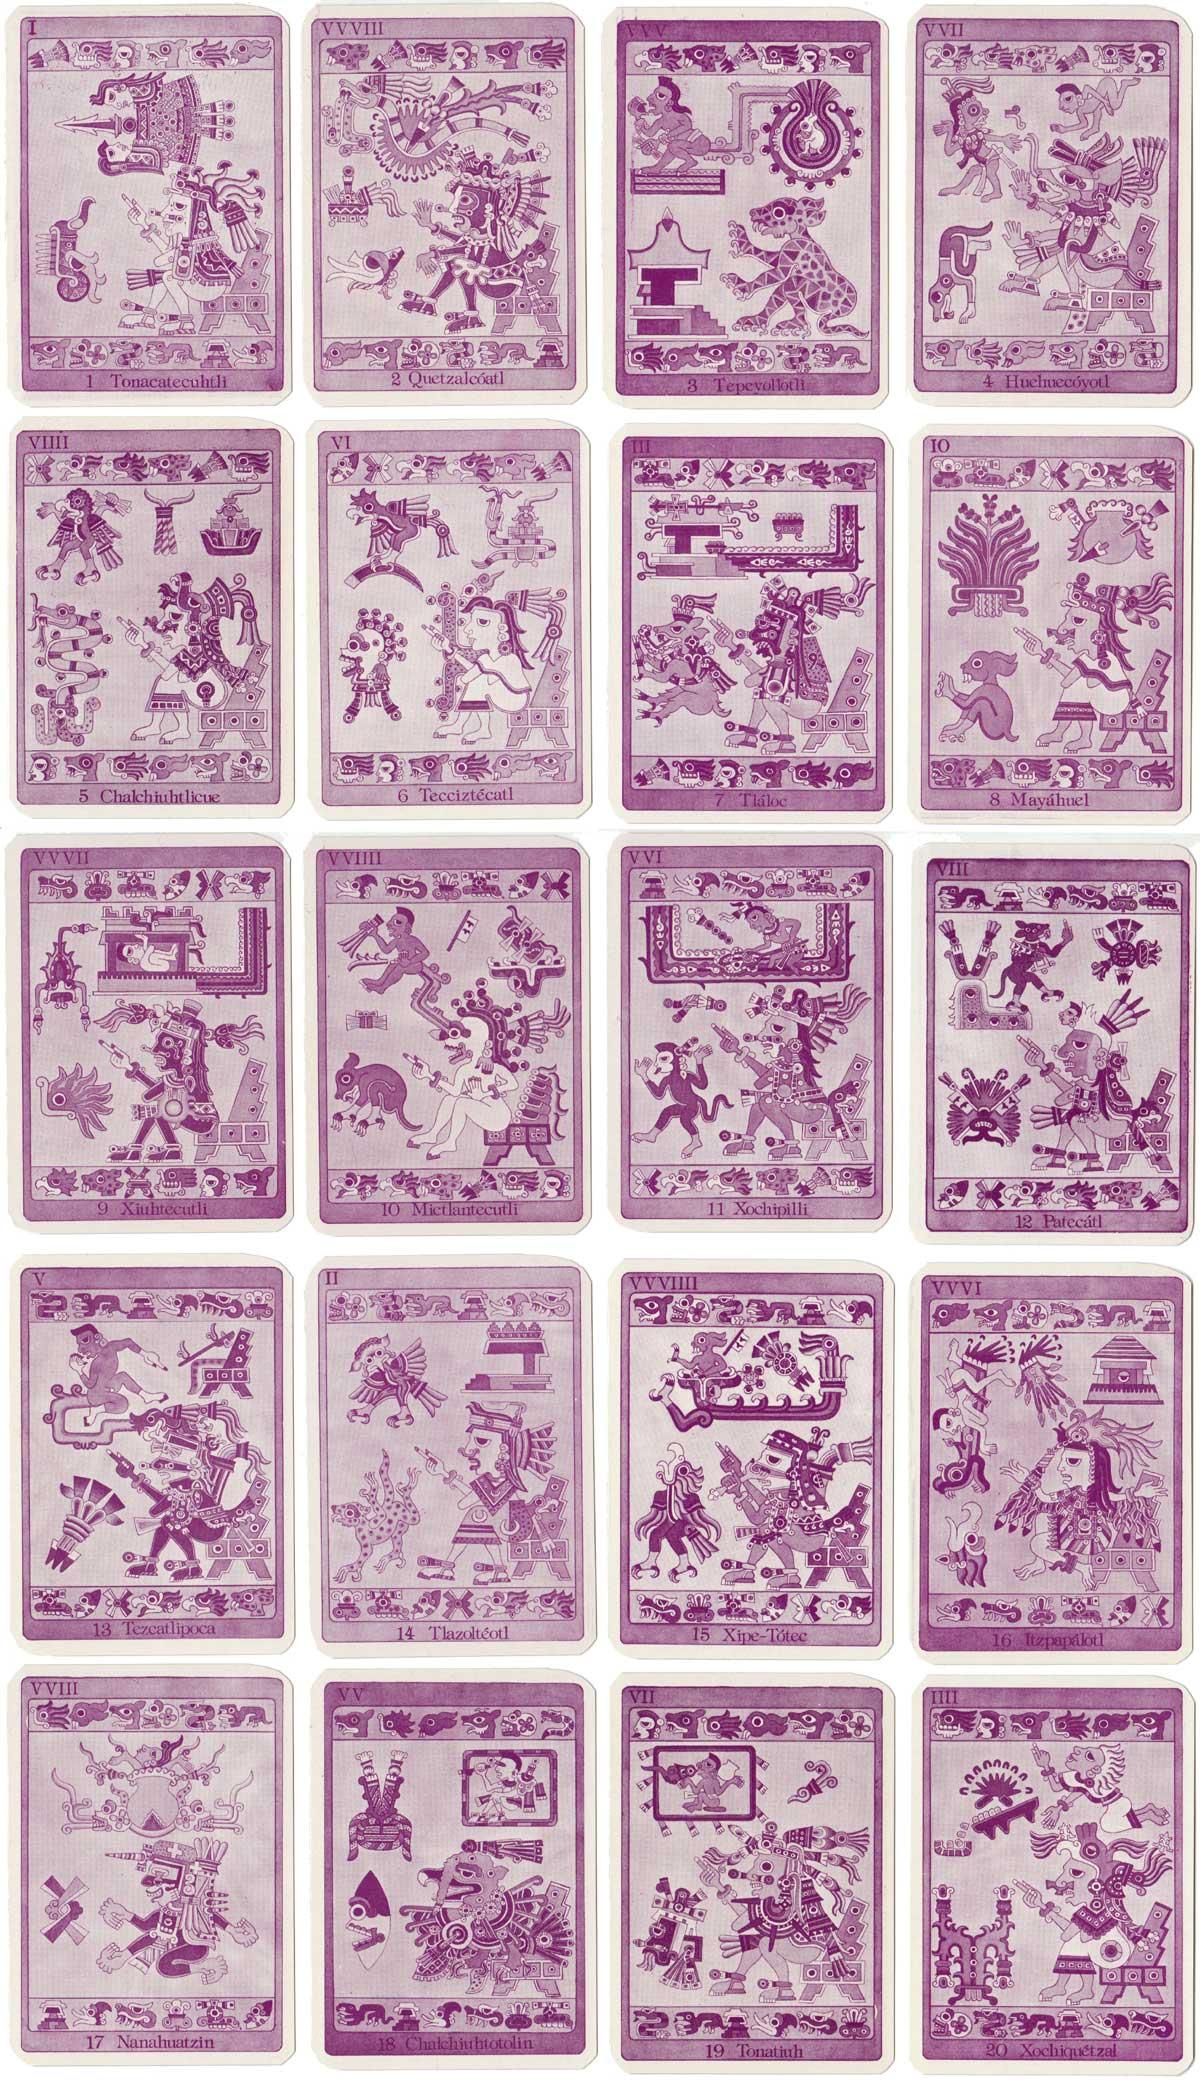 Baraja Tonalamatl Mexican Aztec playing cards based on the prehispanic Codex Borgia manuscript